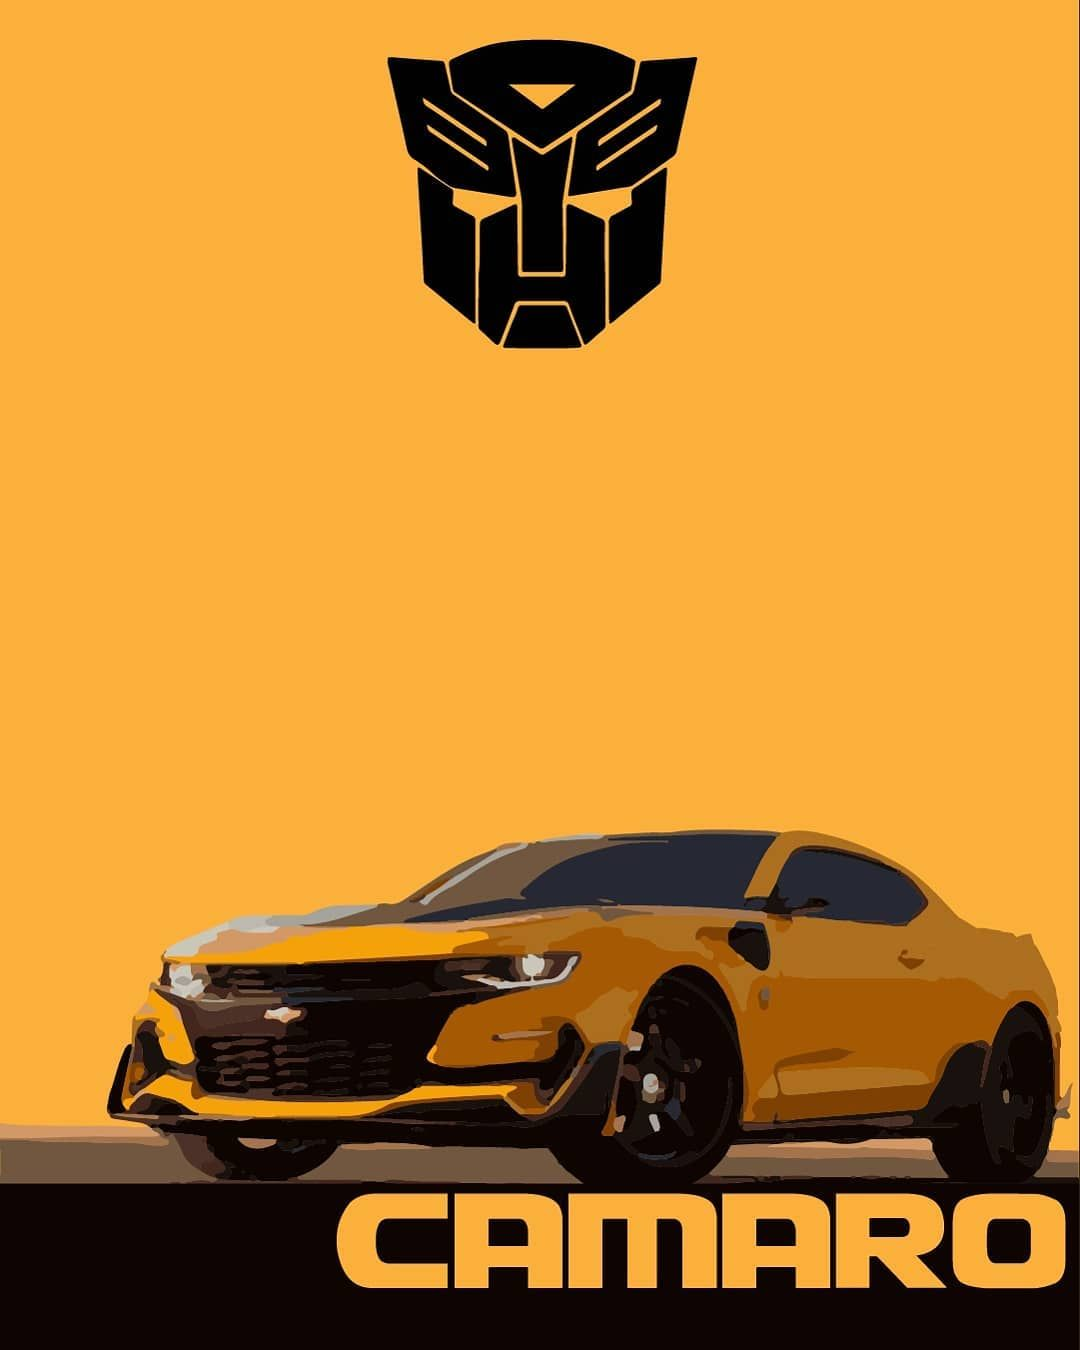 Transformers 3 Bumblebee Car Wallpaper Cars Movie Camaro Chevrolet Camaro